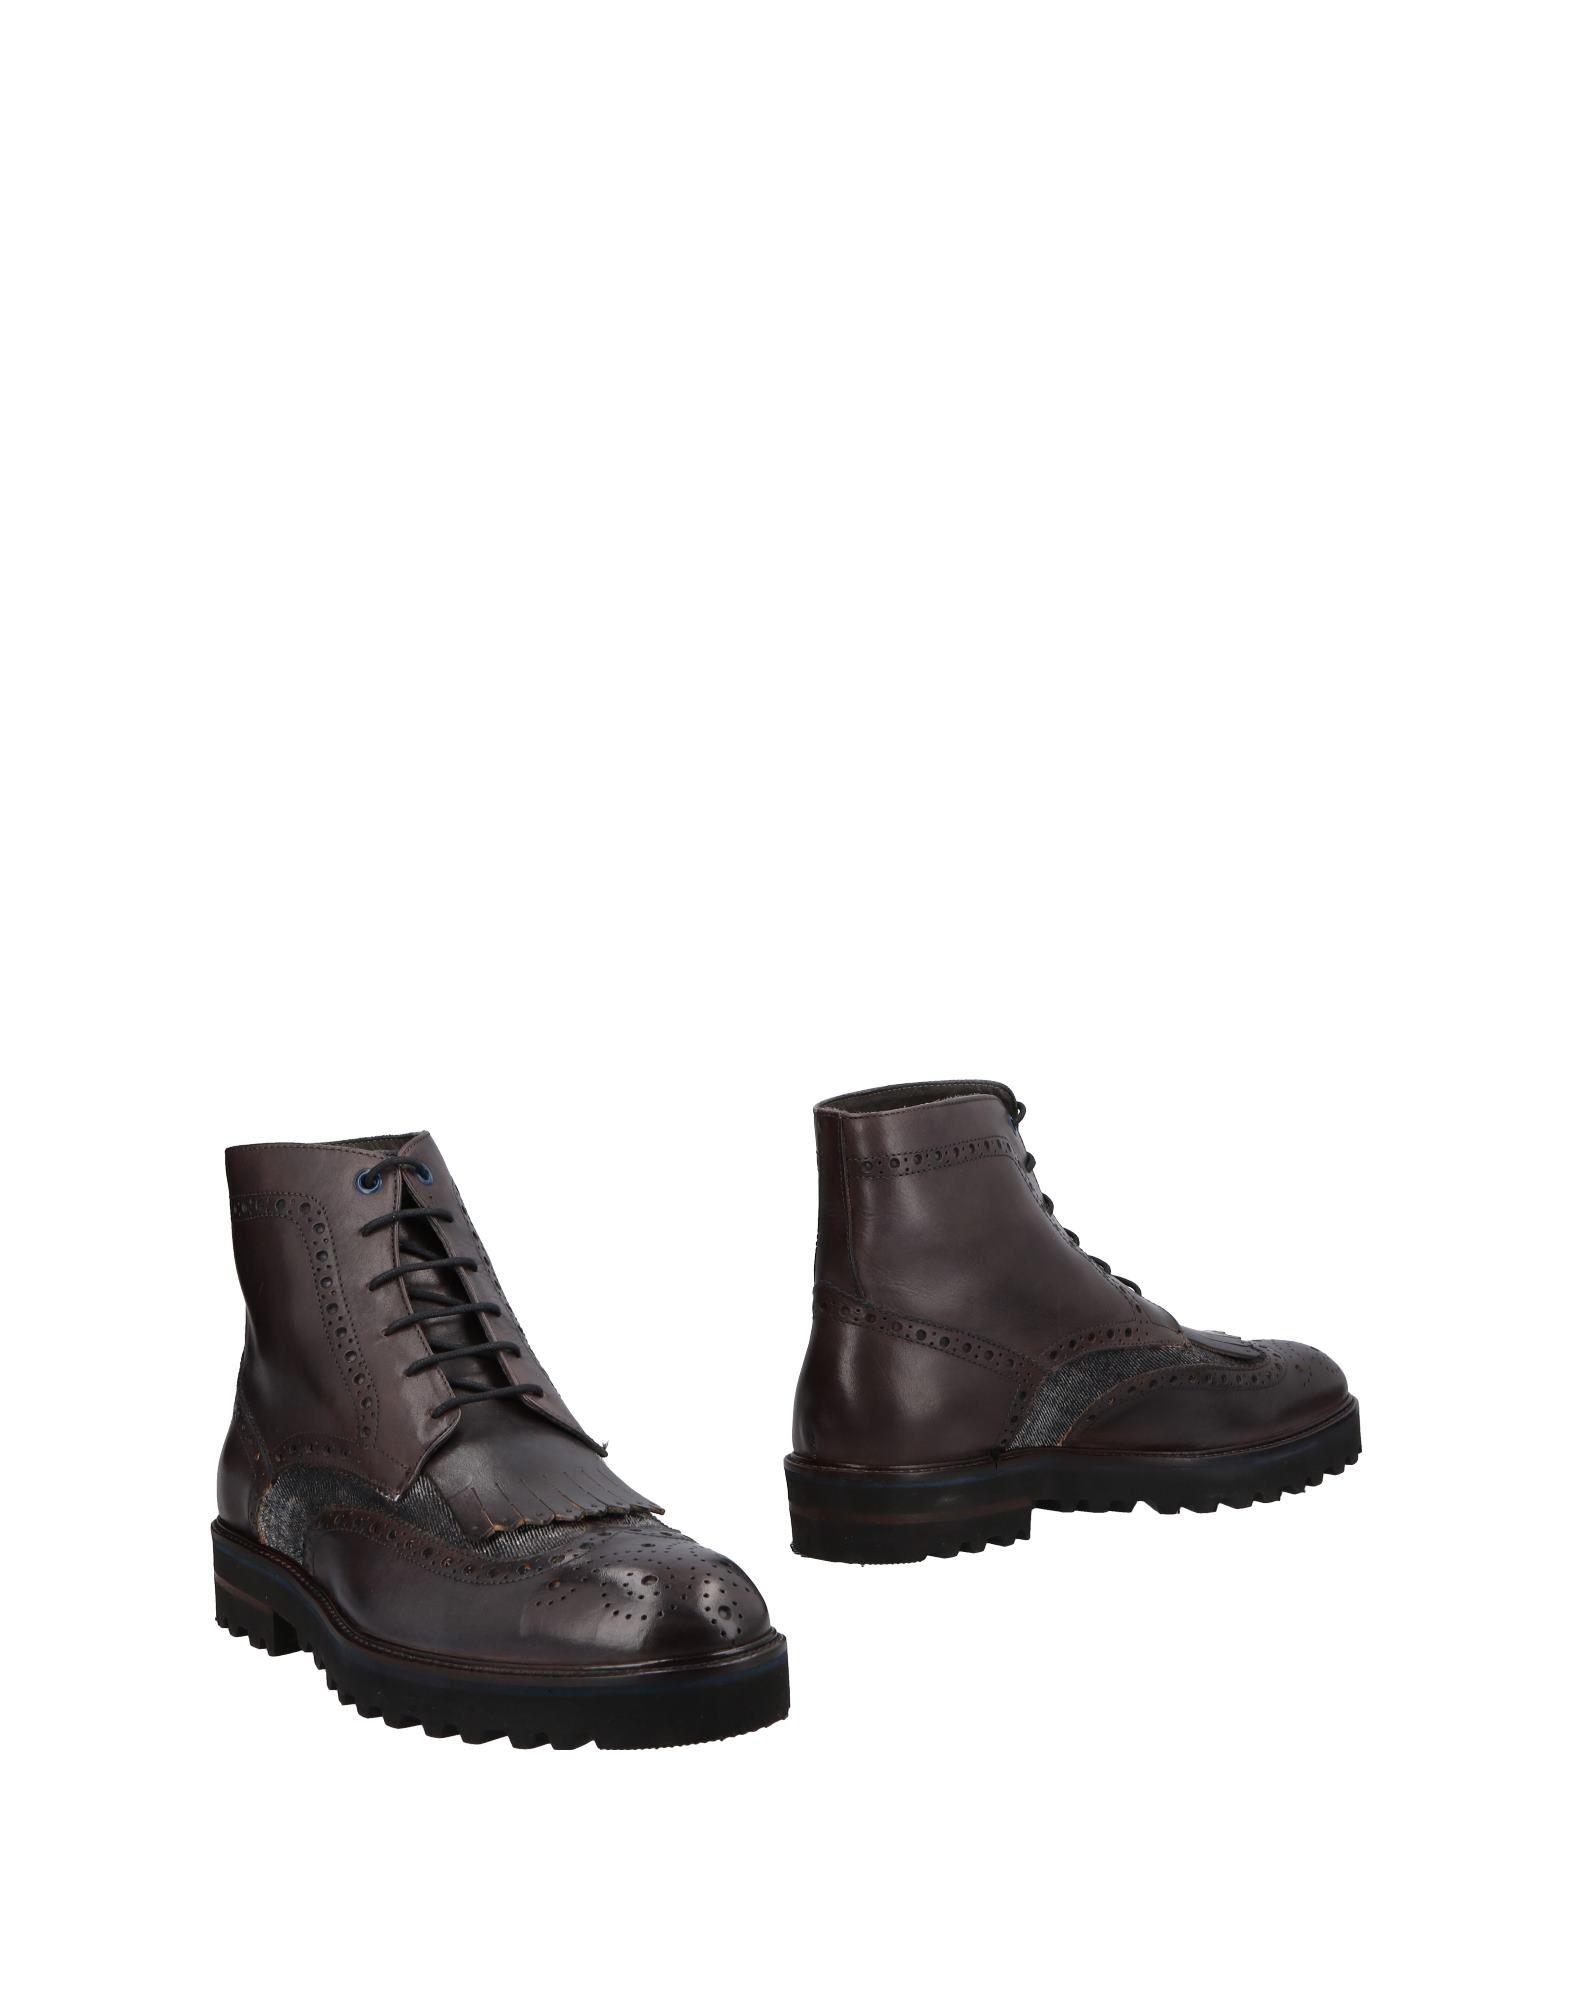 Moda Stivaletti Wexford Uomo - 11491060IV